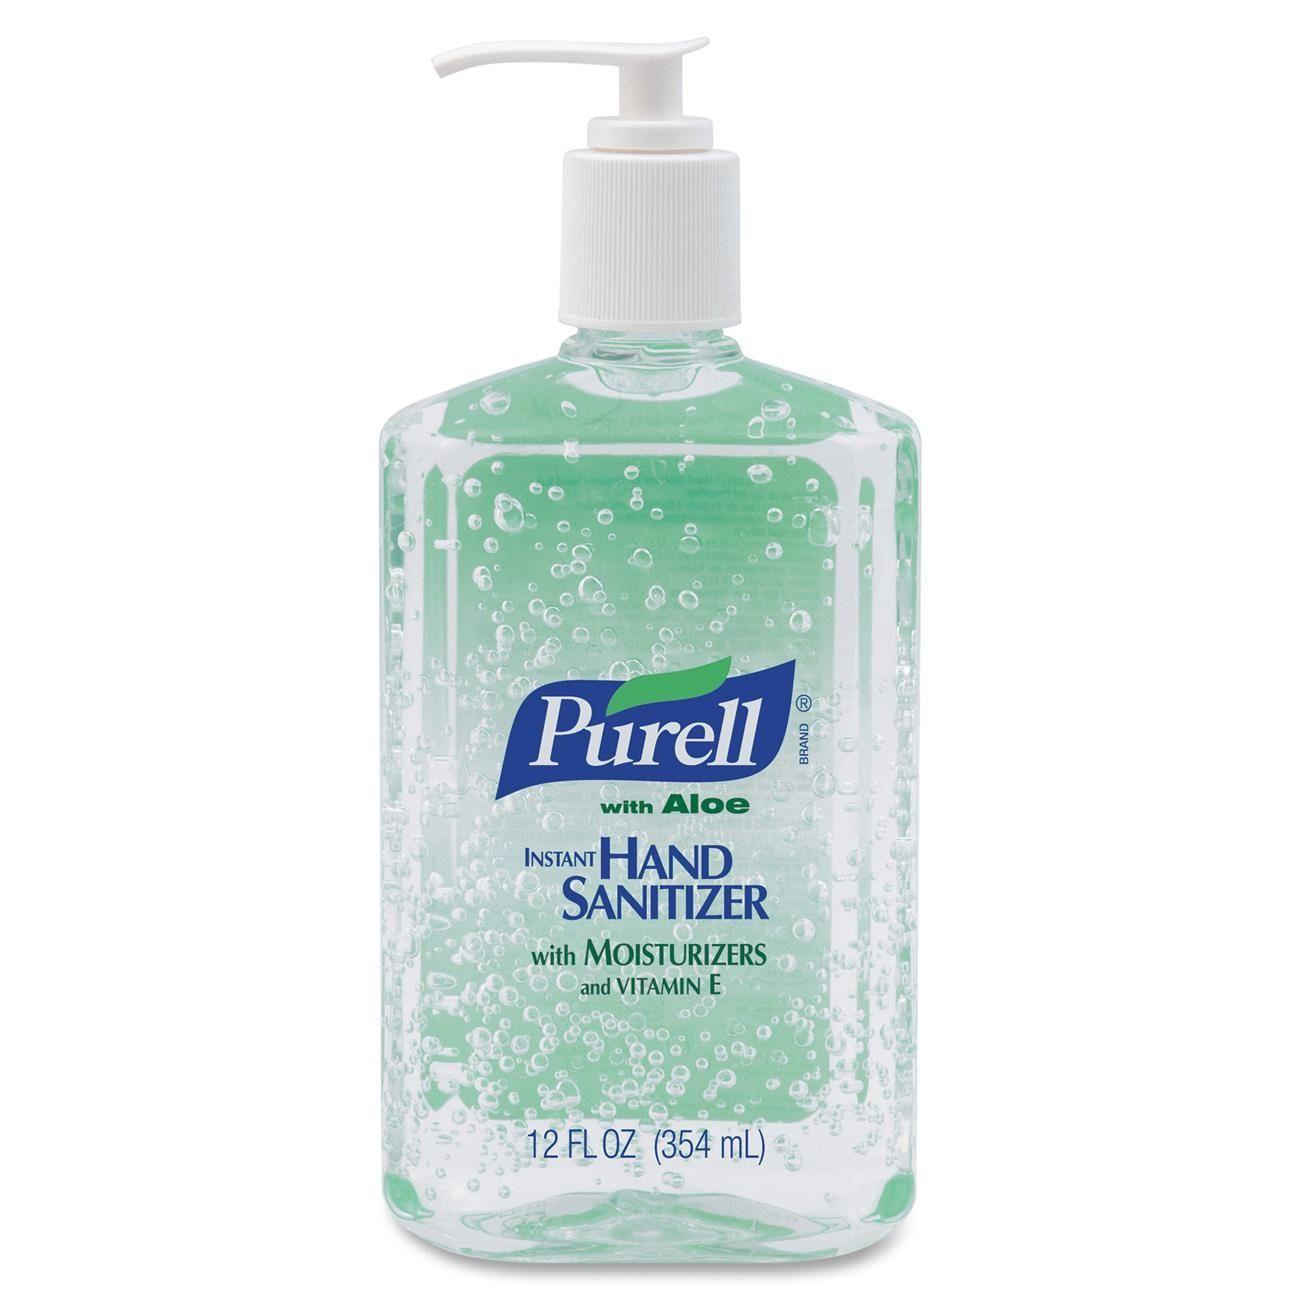 Purell Instant Hand Sanitizer W Aloe Item Goj363912 Instant